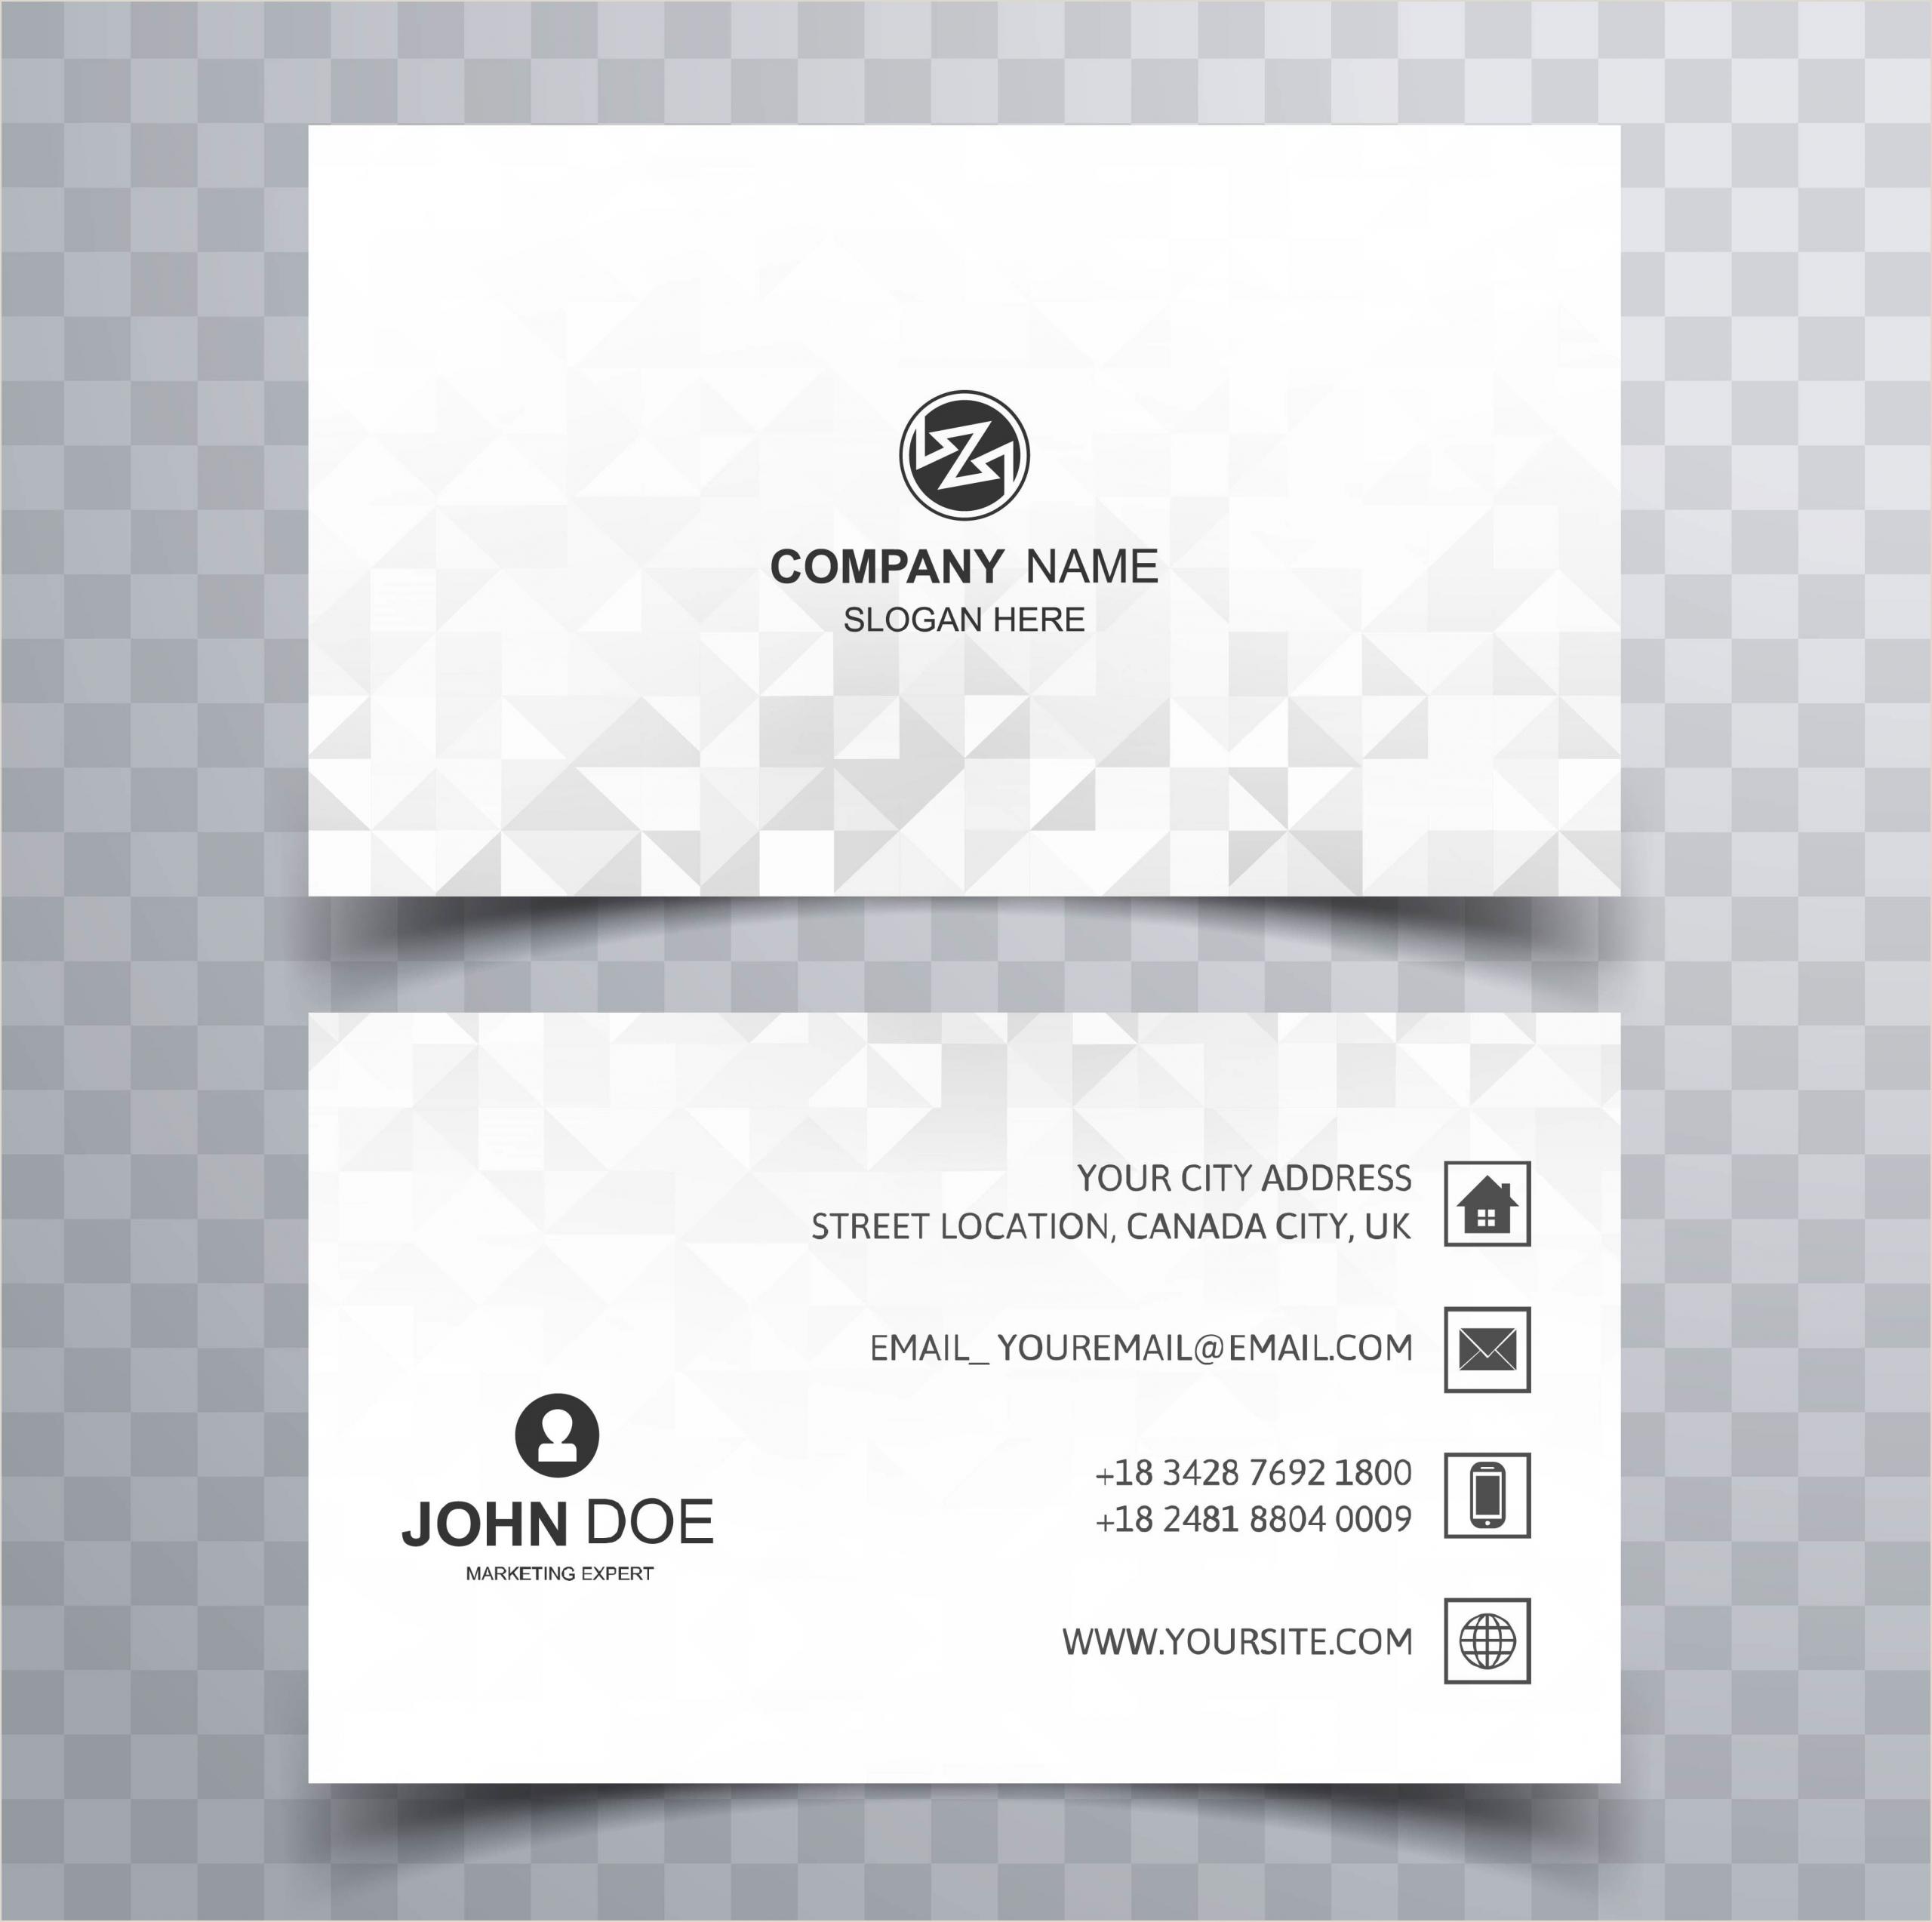 Calling Card Designs Calling Card Free Vector Art 54 282 Free Downloads